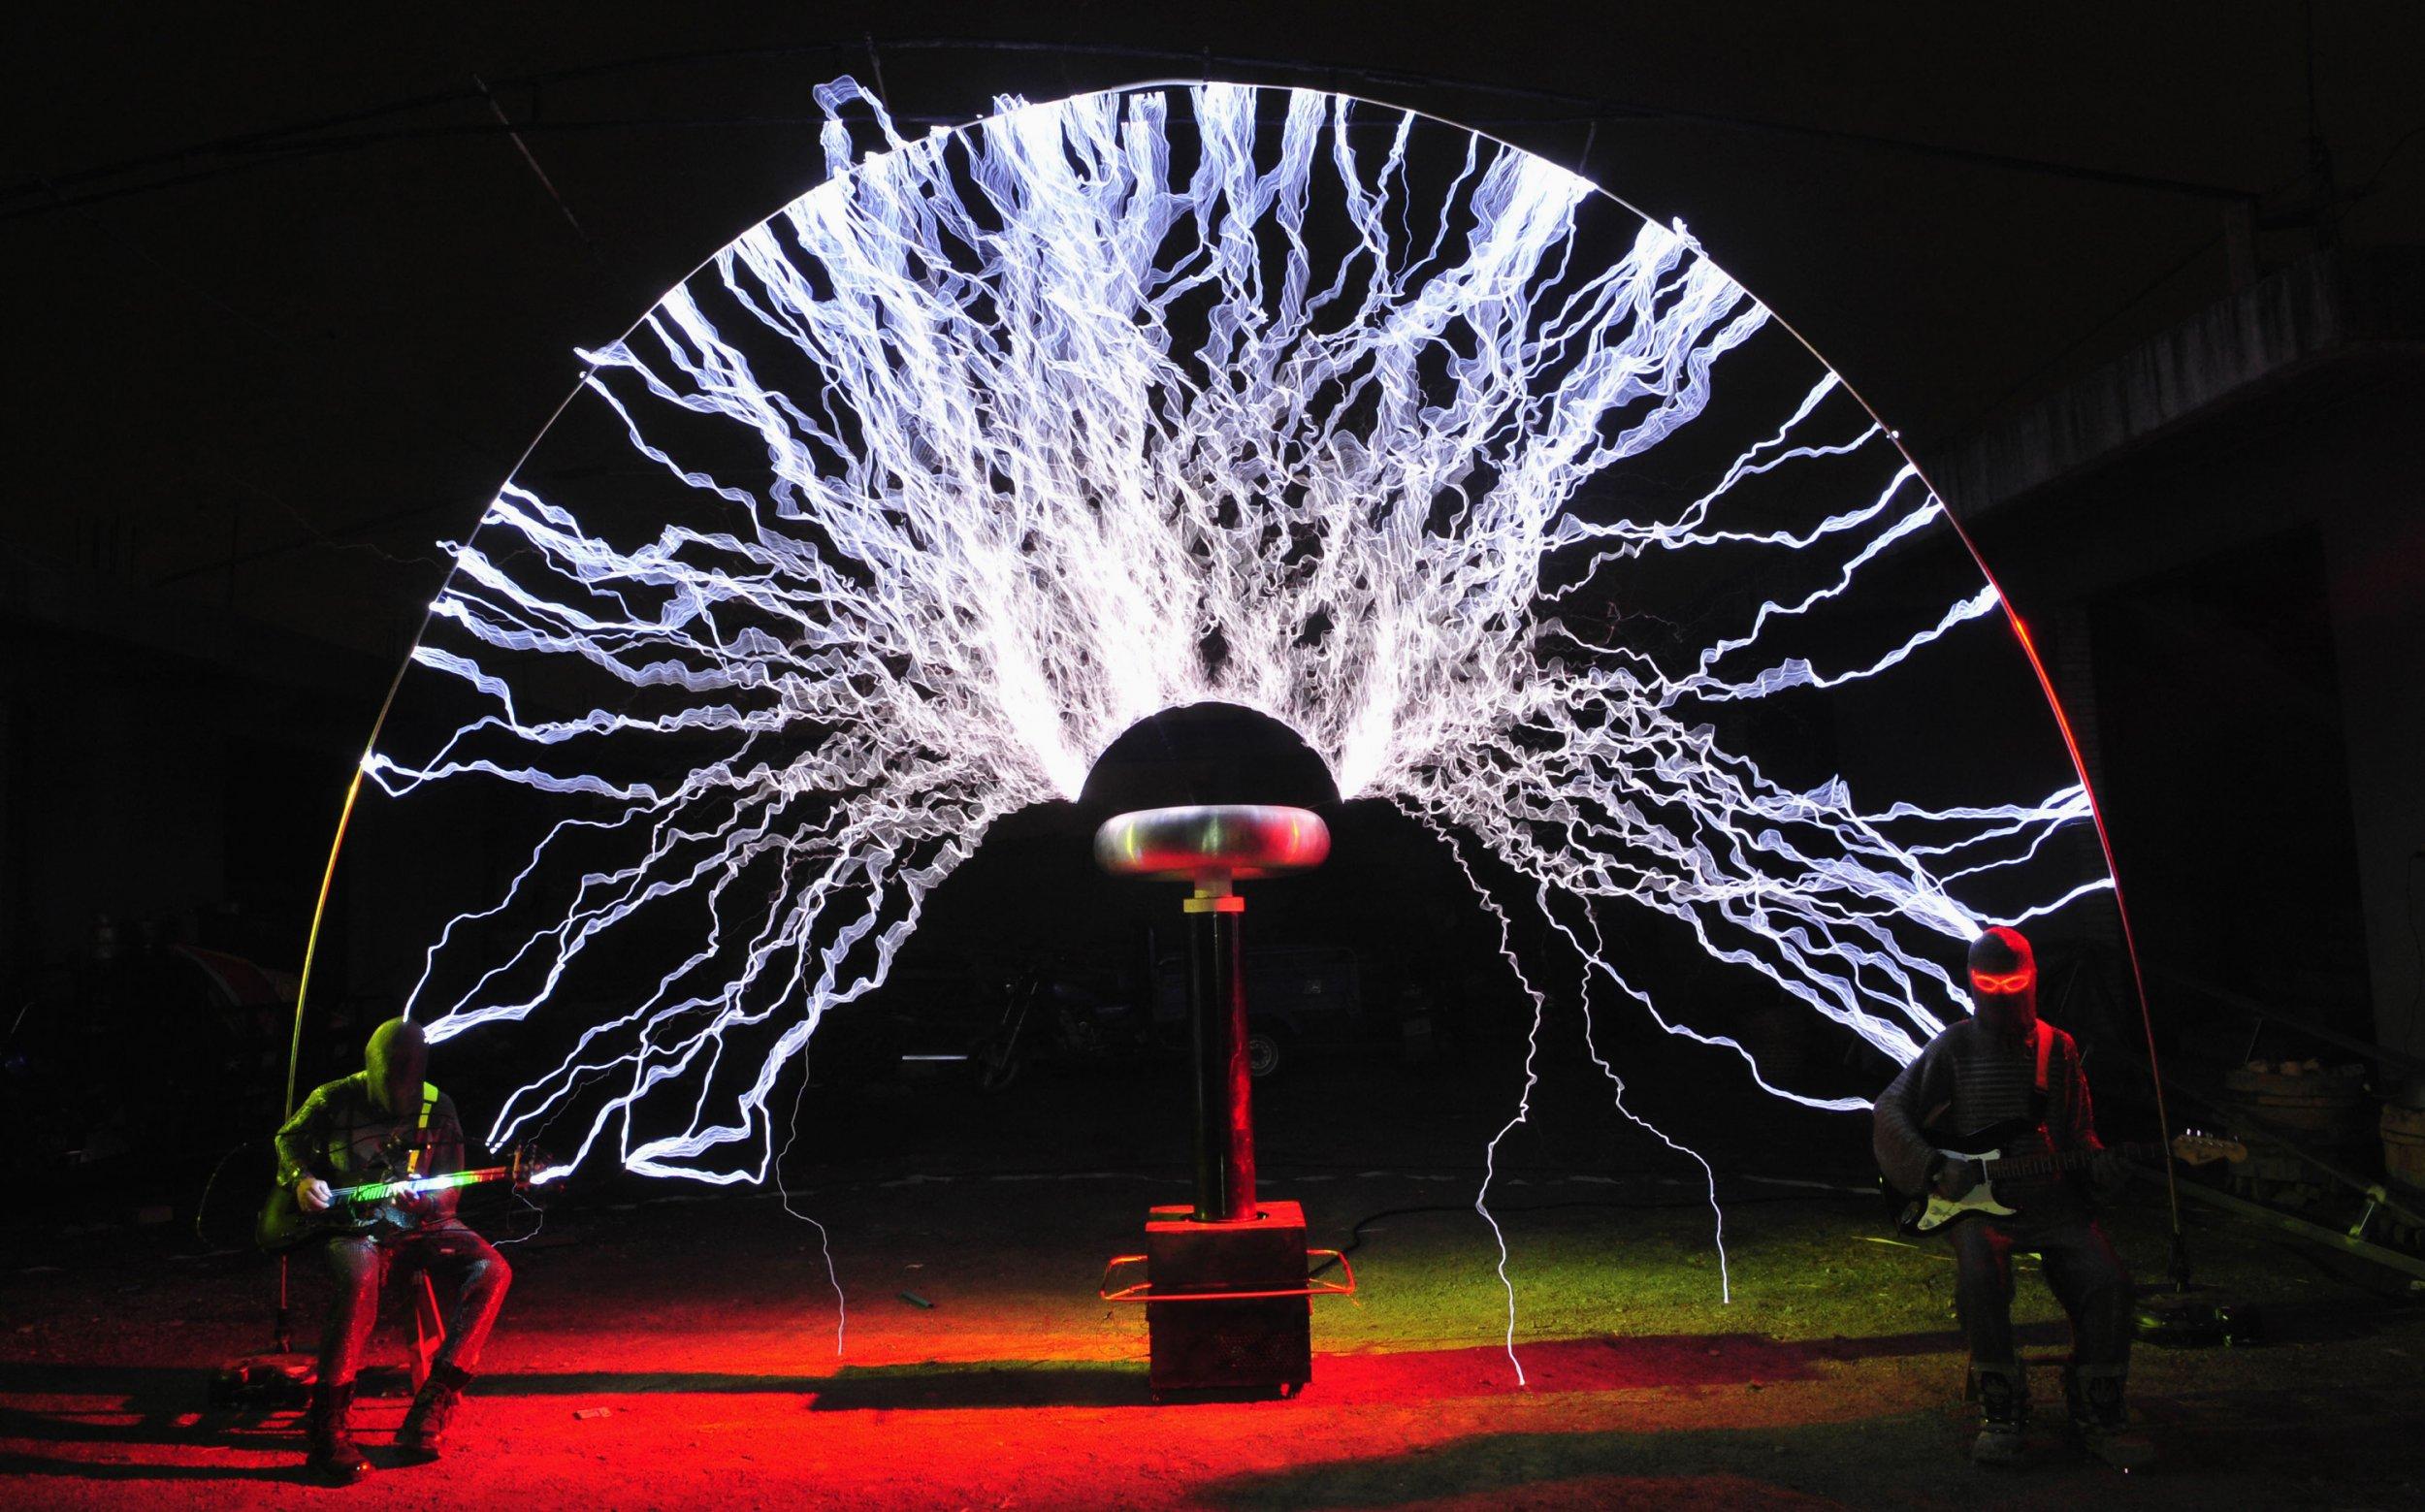 05_02_electricity_01